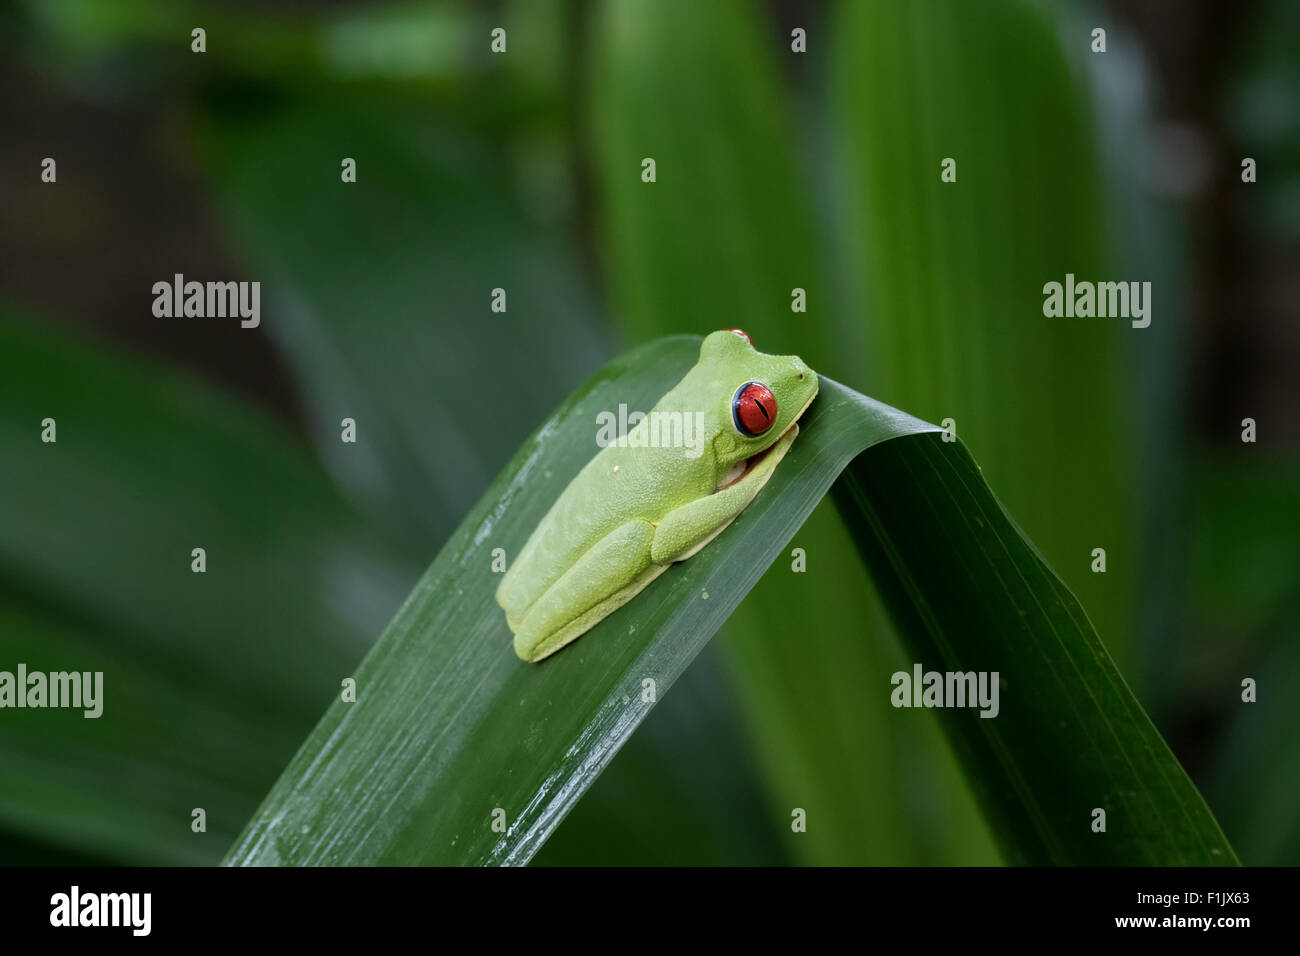 Amphibian stockfotos amphibian bilder alamy for Wildparks in der nahe